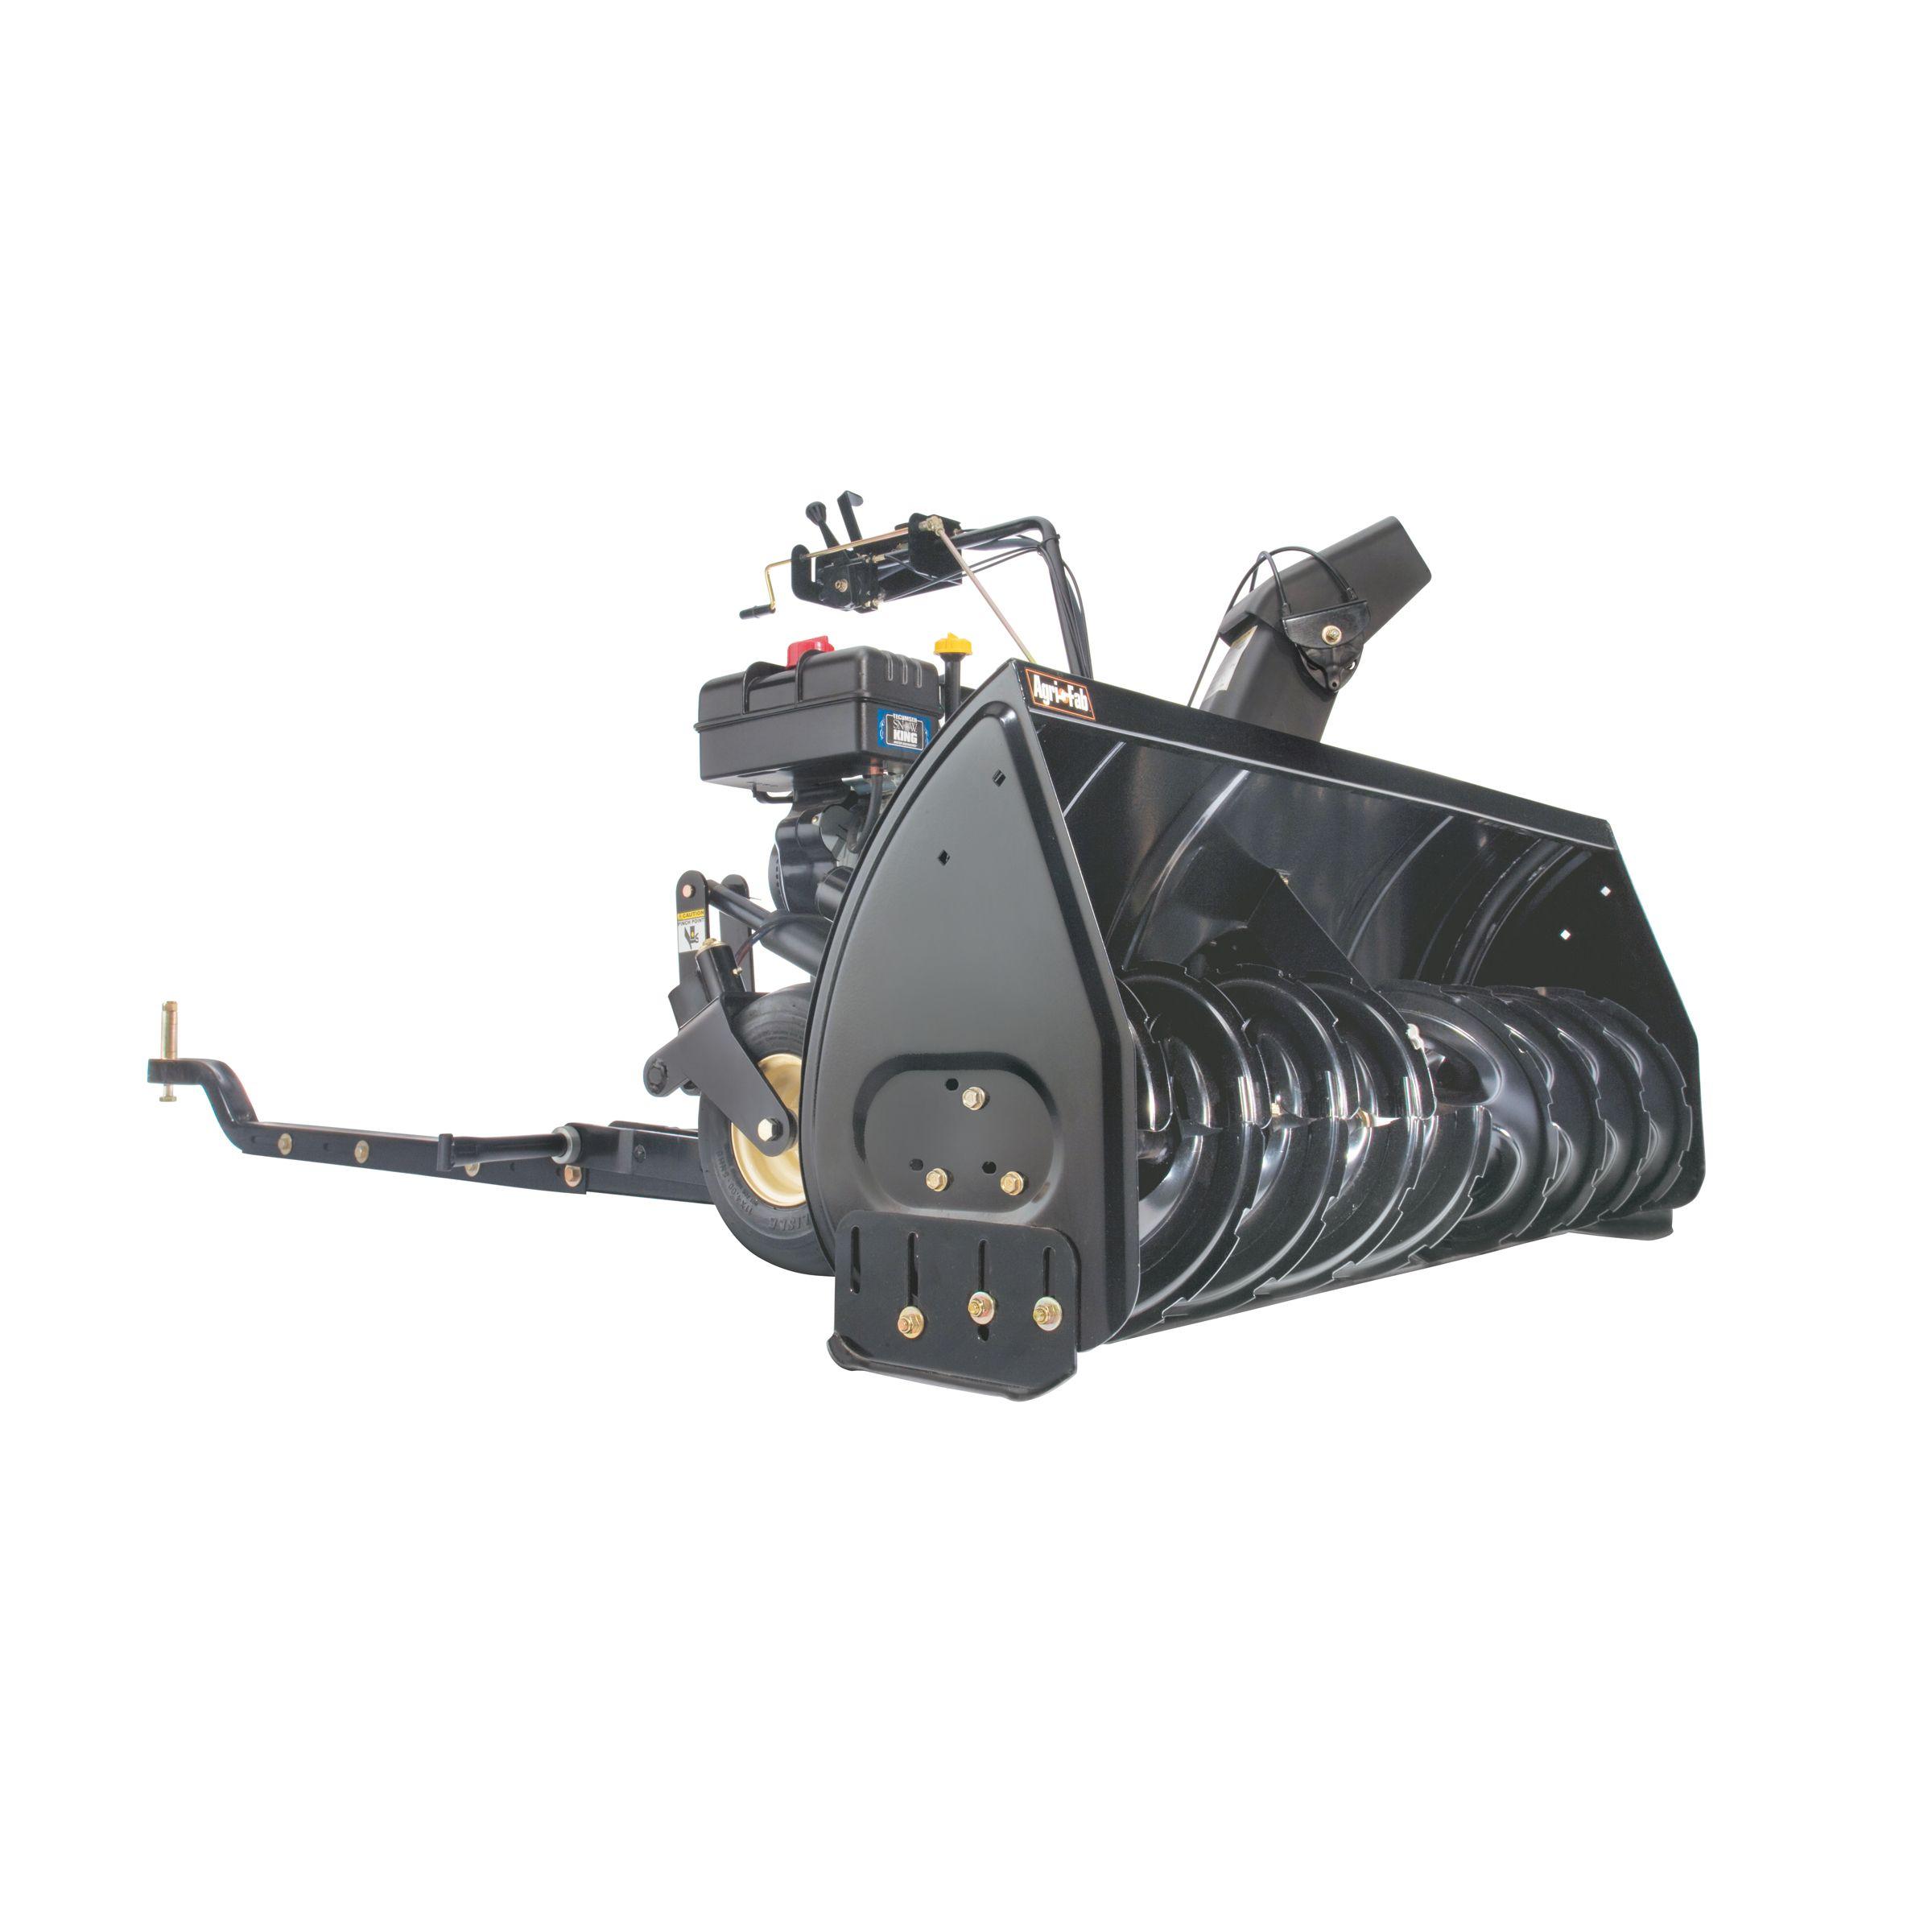 Agri Fab ATV 2 Stage Snowblower Multi Fit Lawn